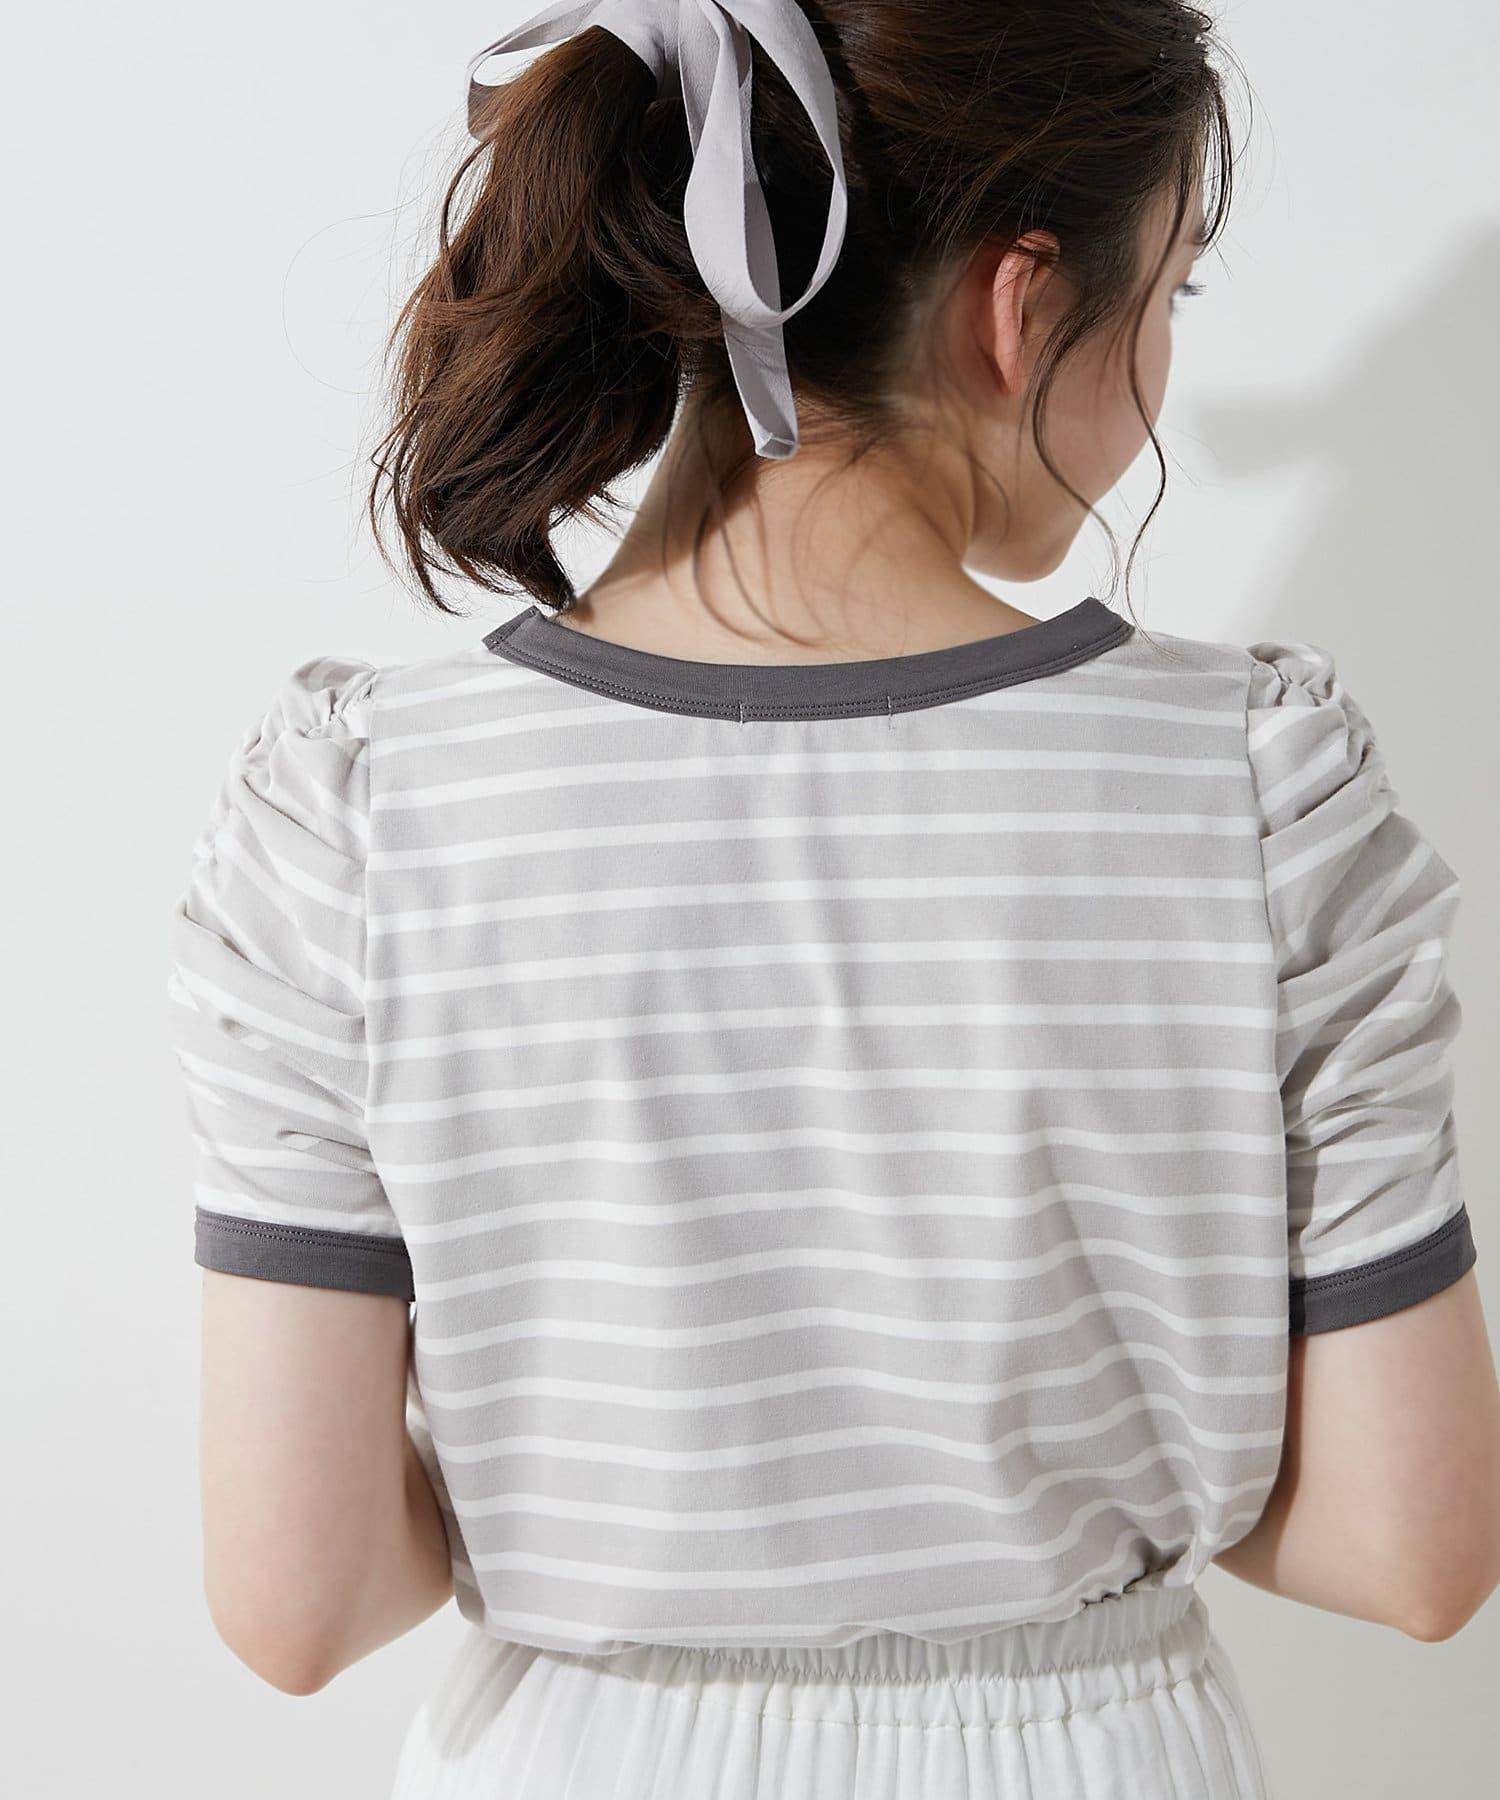 OLIVE des OLIVE(オリーブ デ オリーブ) ボーダーリンガーTシャツ